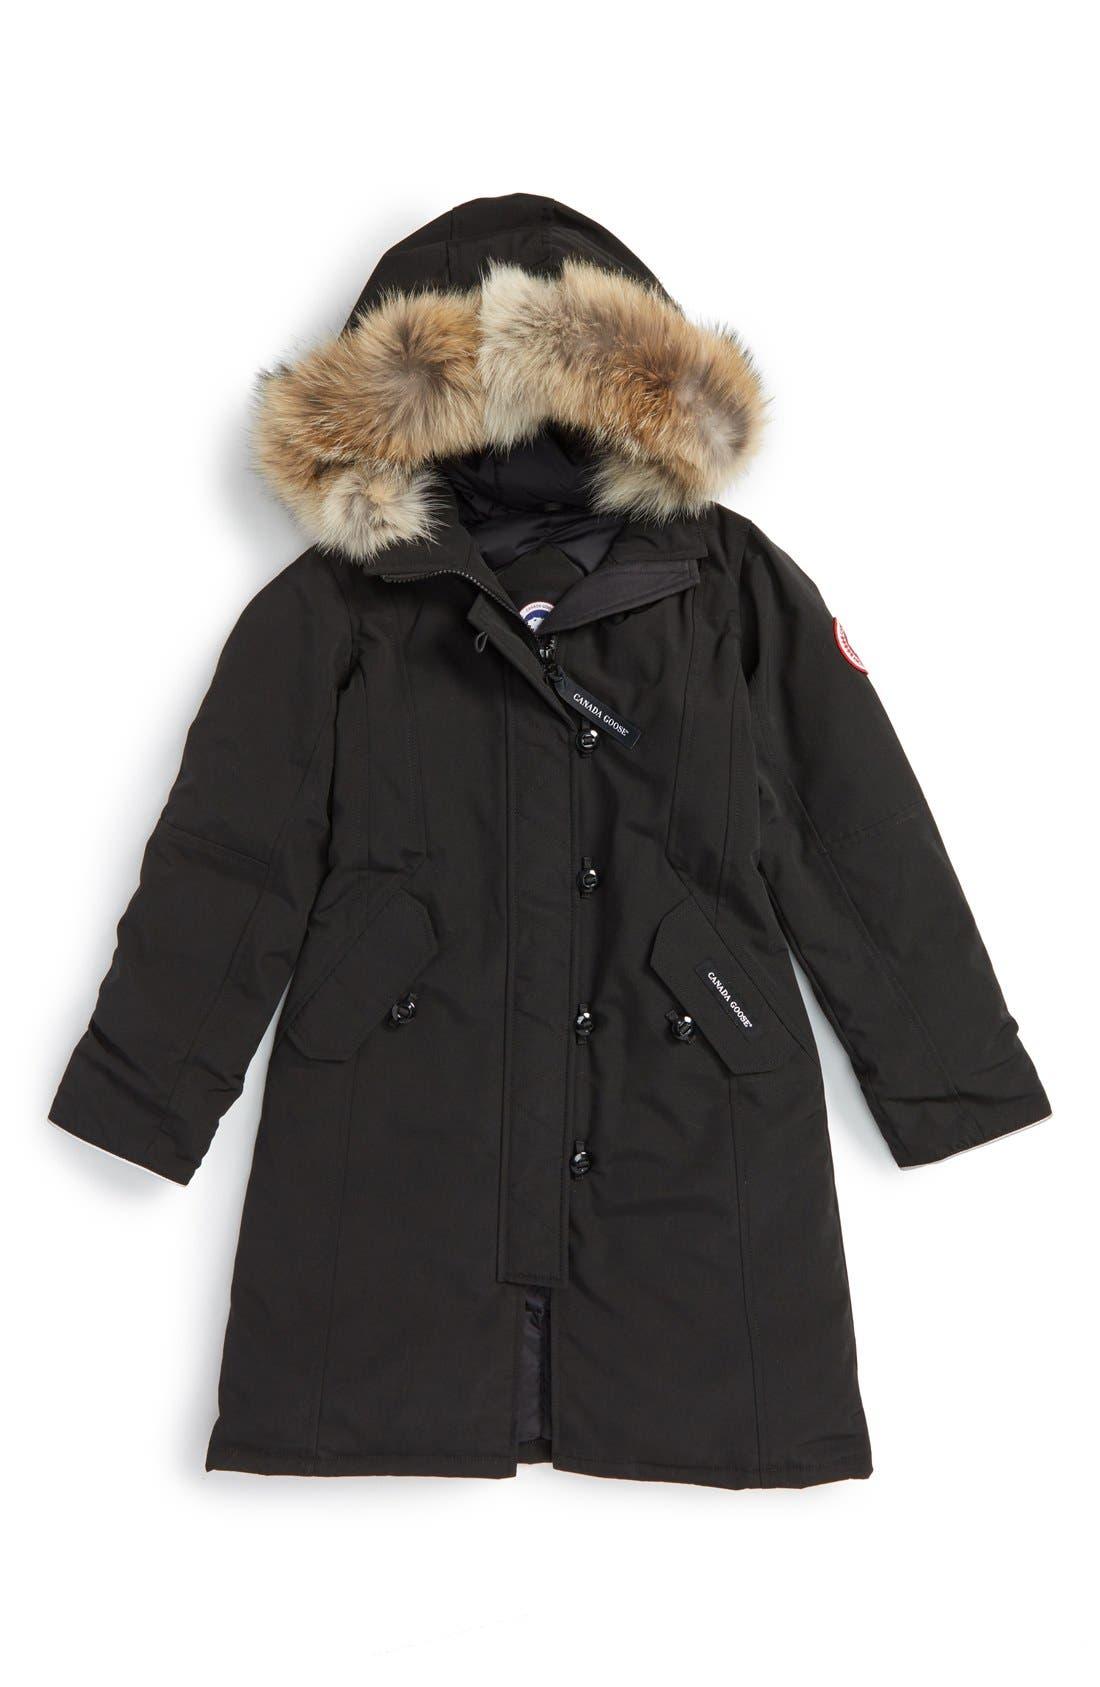 CANADA GOOSE 'Brittania' Down Parka with Genuine Coyote Fur Trim, Main, color, BLACK